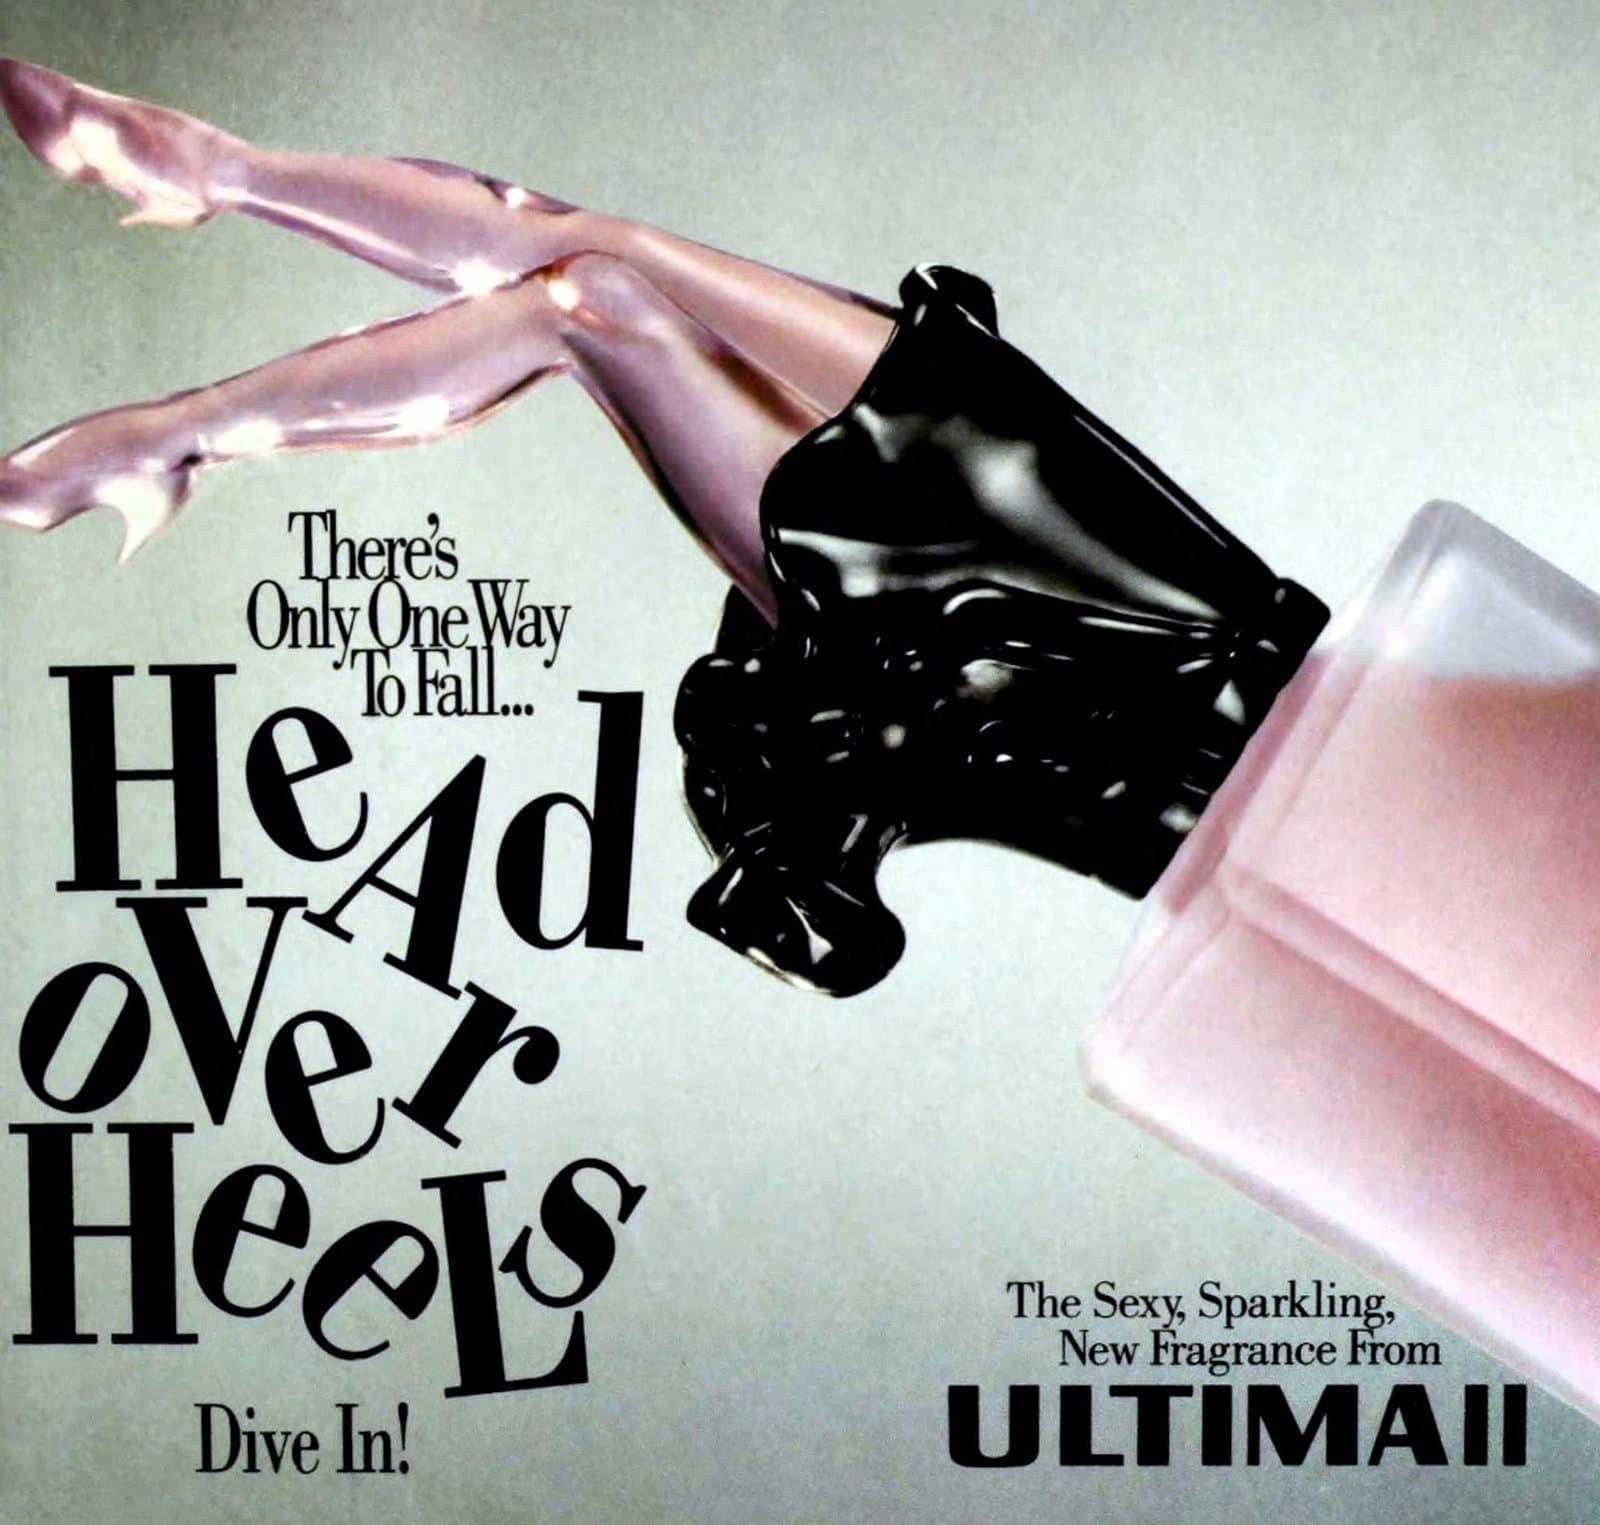 Head Over Heels fragrance from Ultima II (1994) at ClickAmericana.com